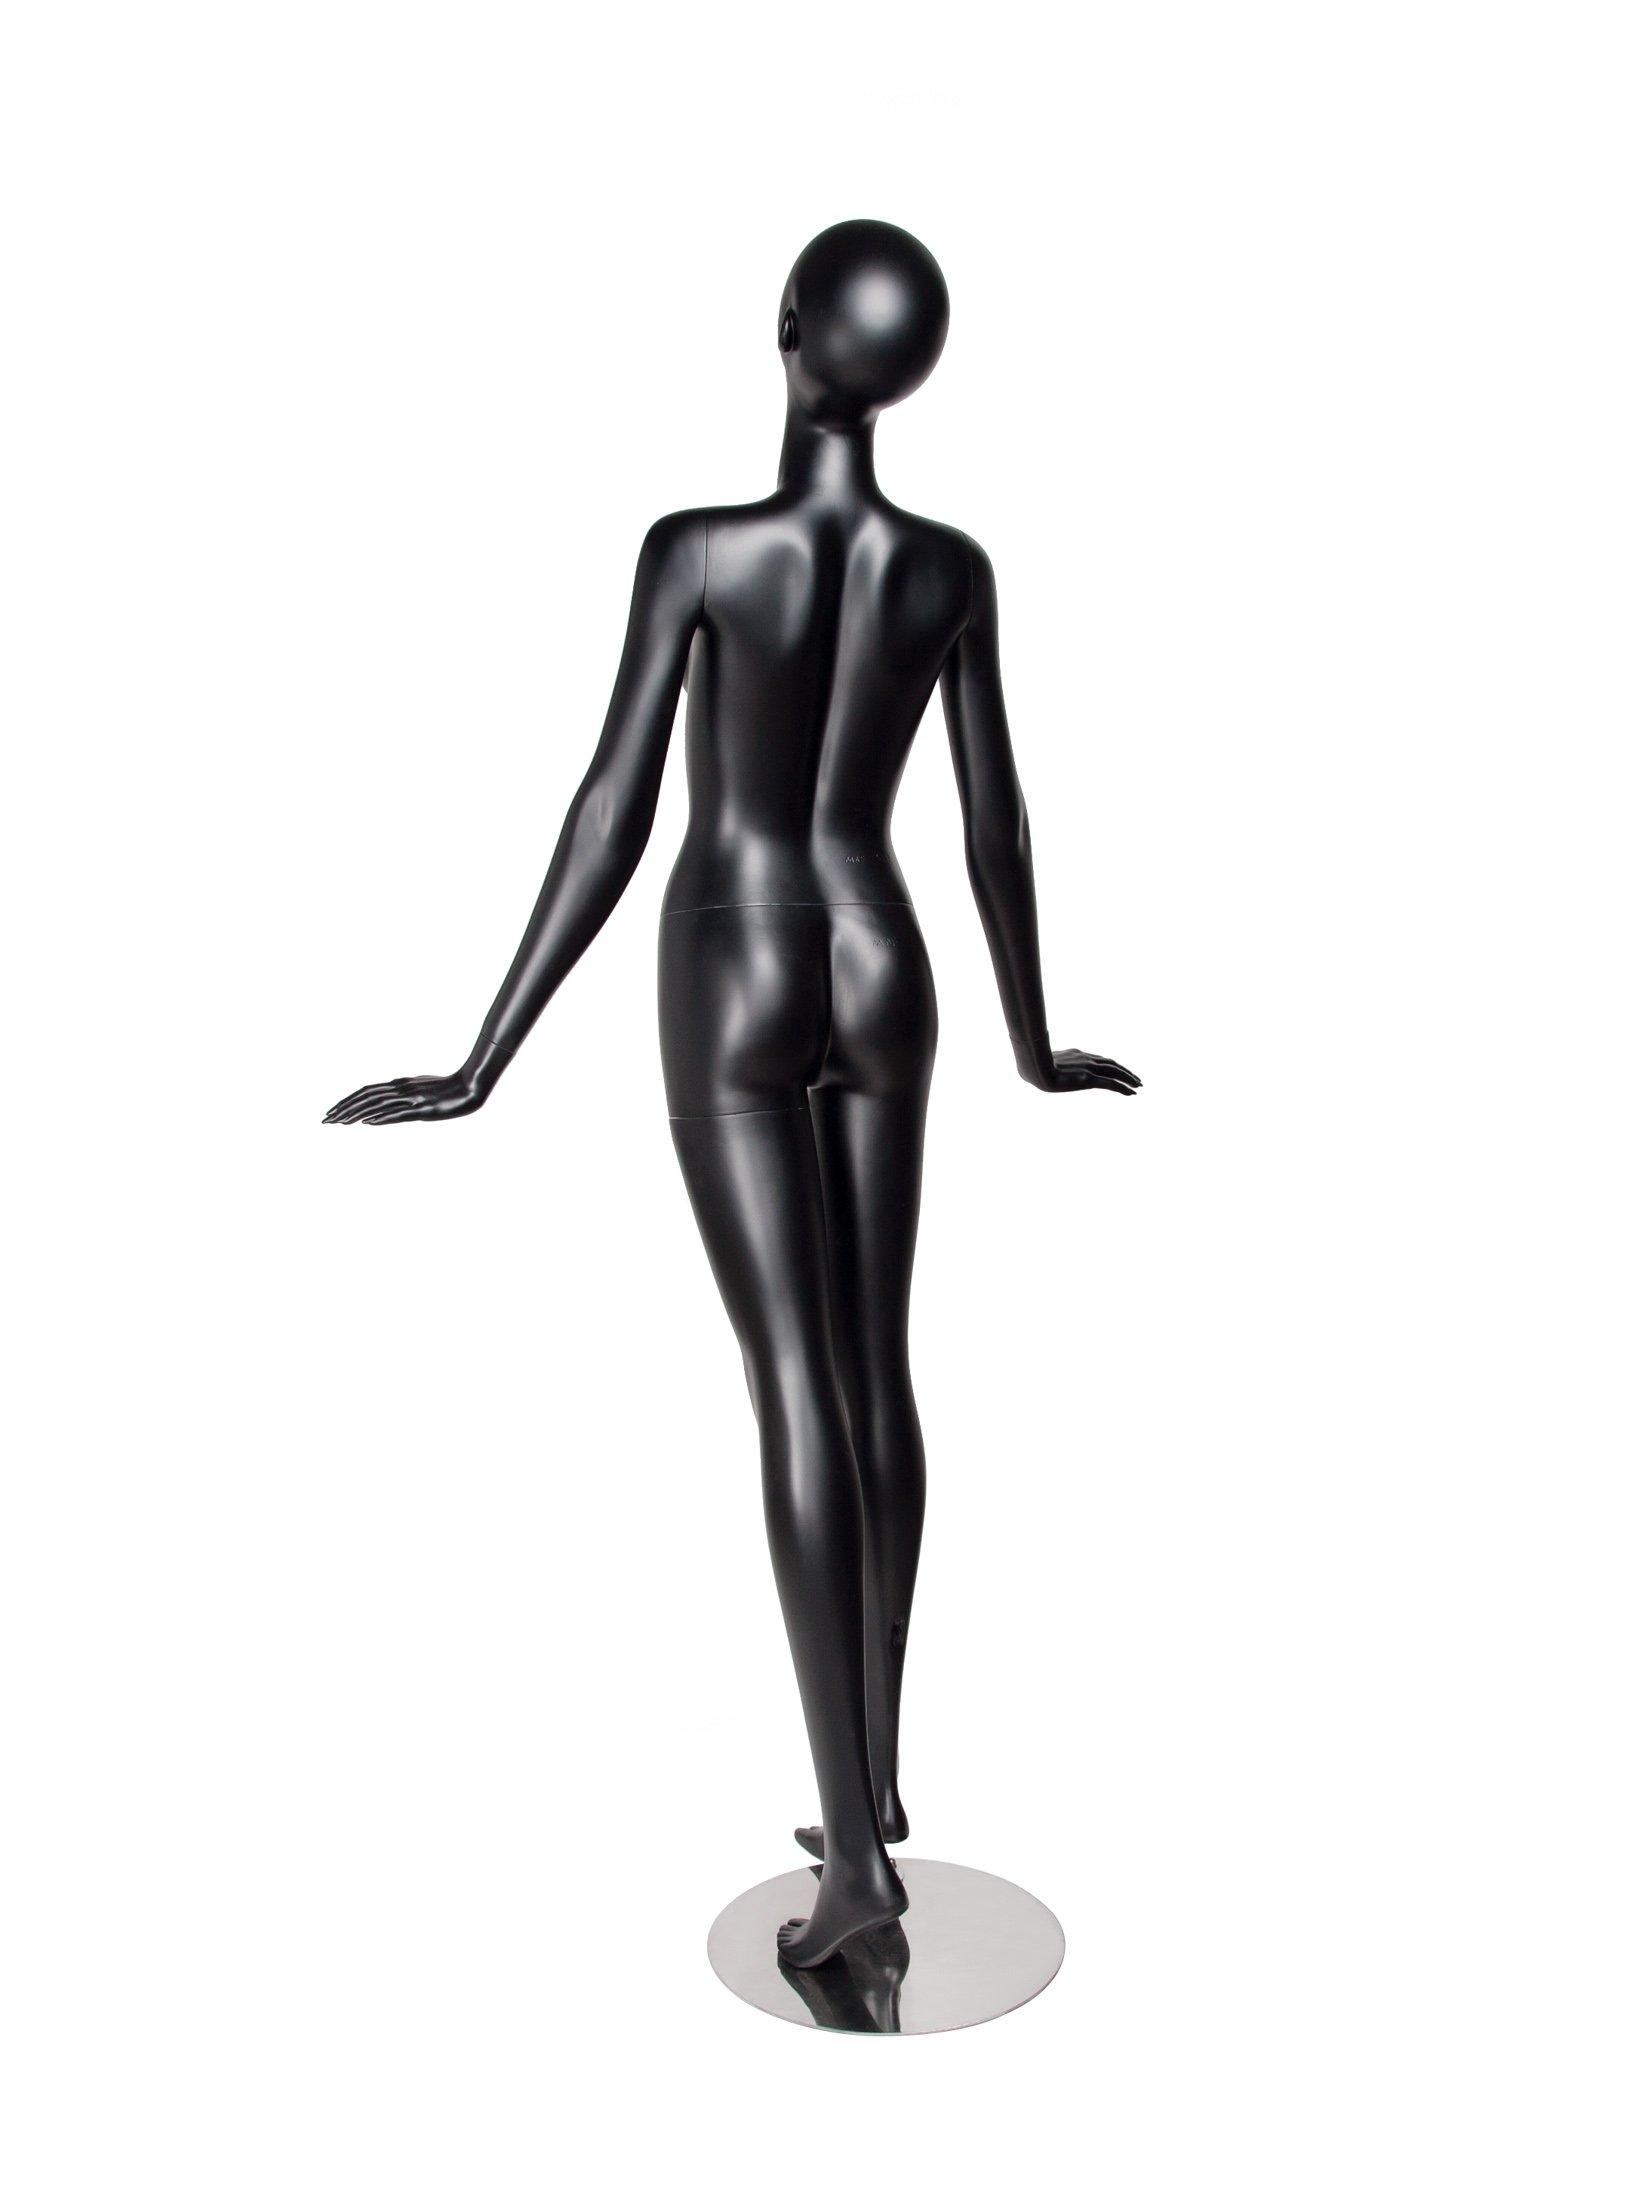 Newtech Display MAF-S2-EGG9/BLK (EGG9) Egg Female Mannequin, Matte Black by Newtech Display (Image #3)